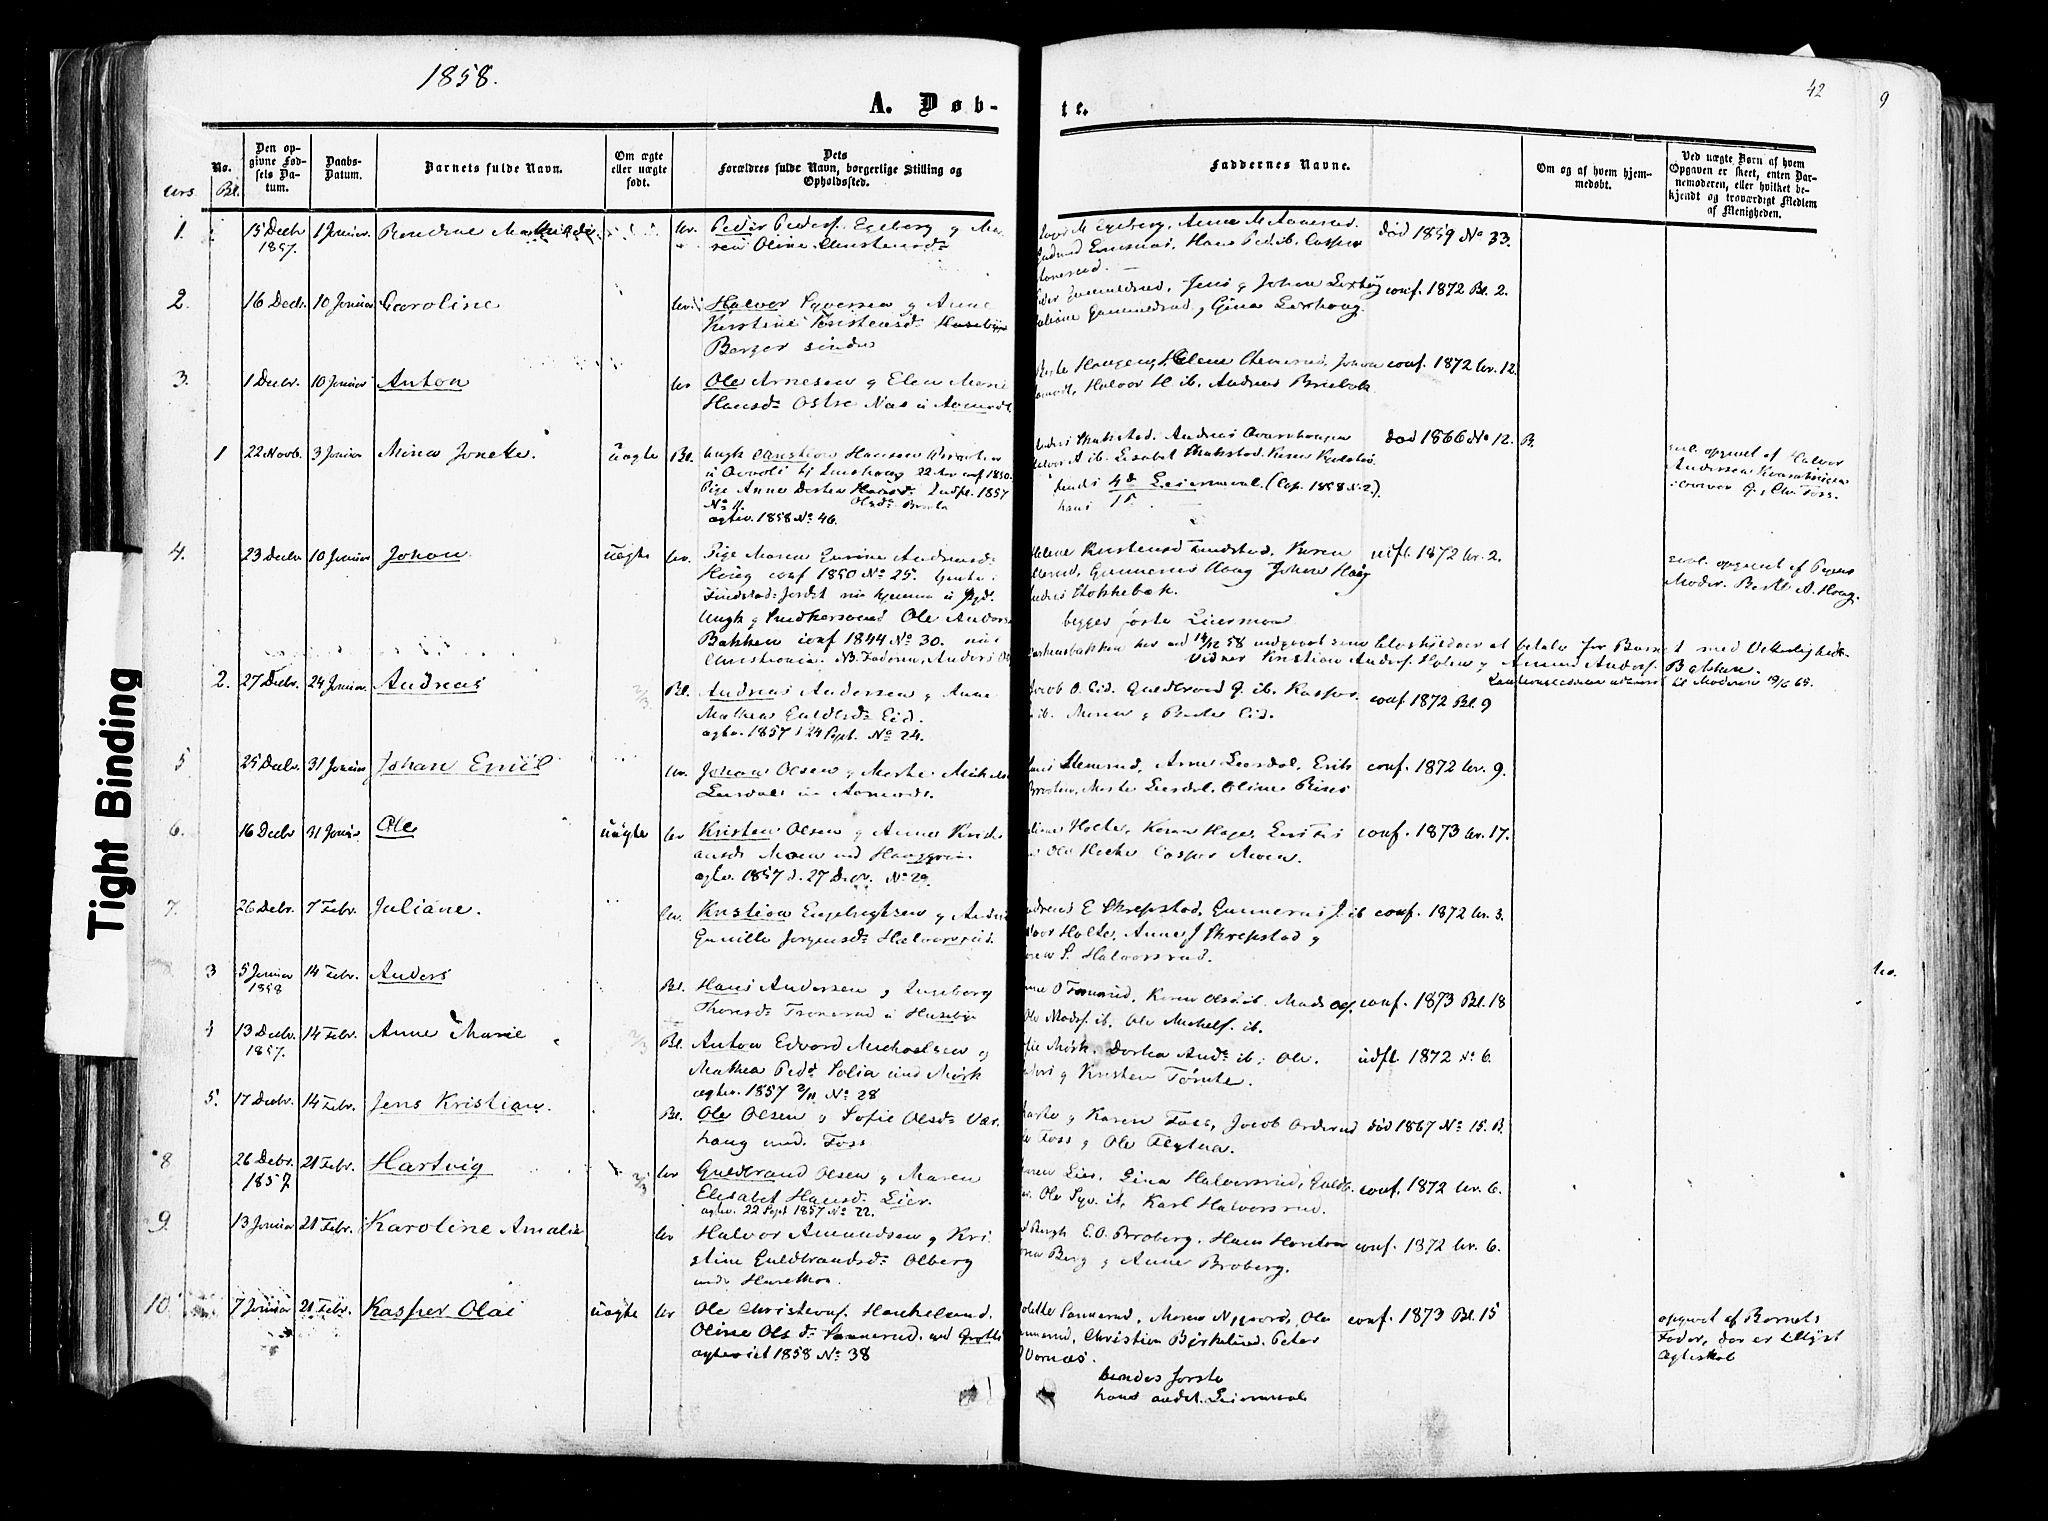 SAO, Aurskog prestekontor Kirkebøker, F/Fa/L0007: Ministerialbok nr. I 7, 1854-1877, s. 42